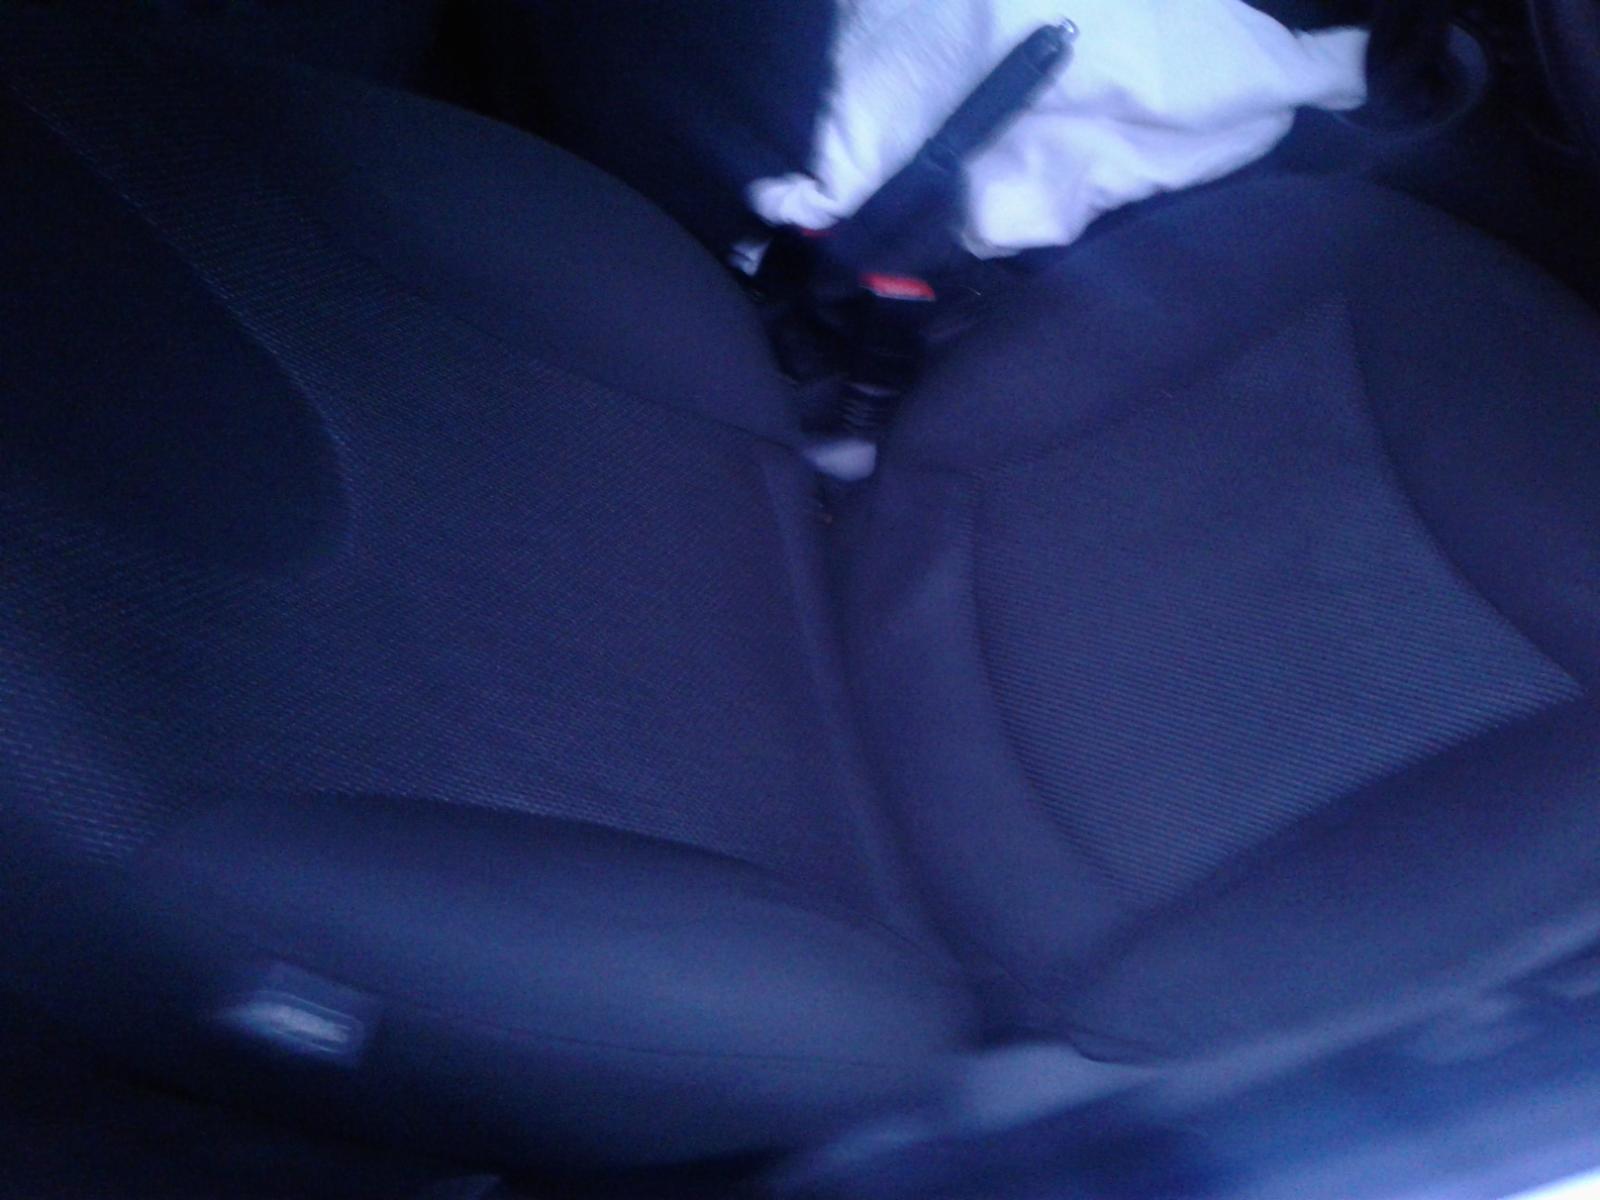 Image for a MINI (BMW) MINI 2007 3 Door Hatchback